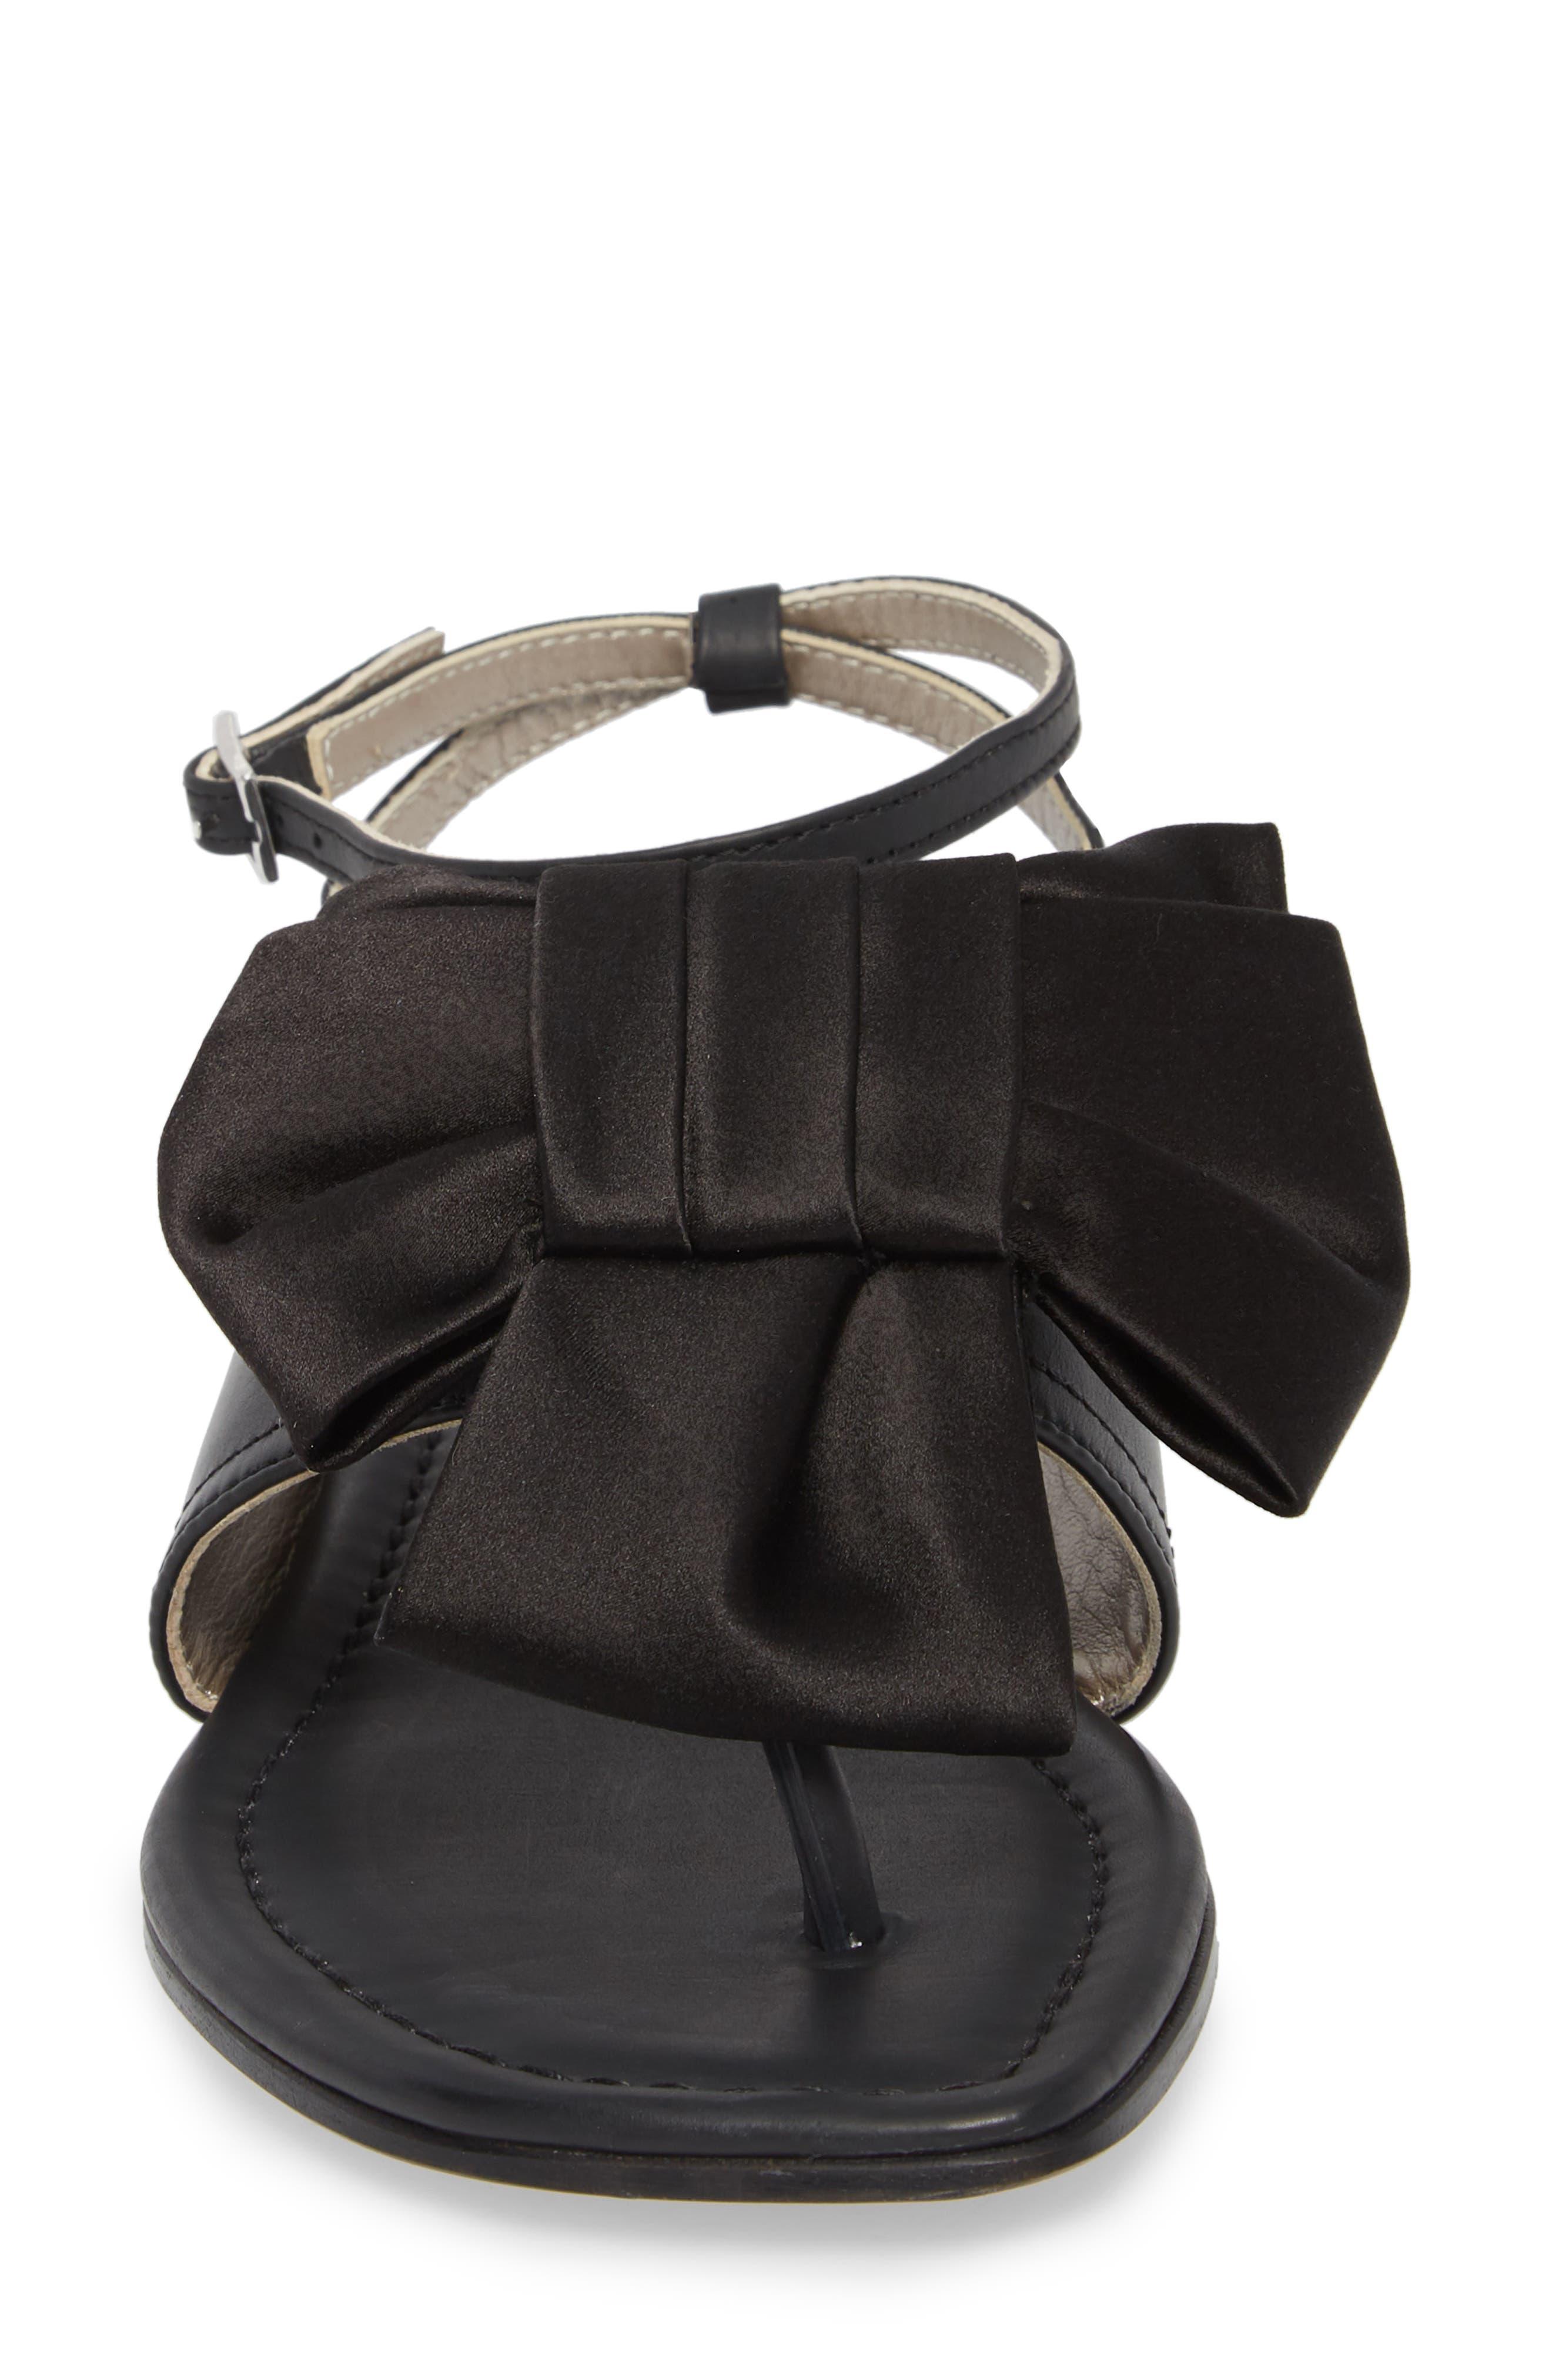 Ankle Strap Sandal,                             Alternate thumbnail 4, color,                             Black Leather